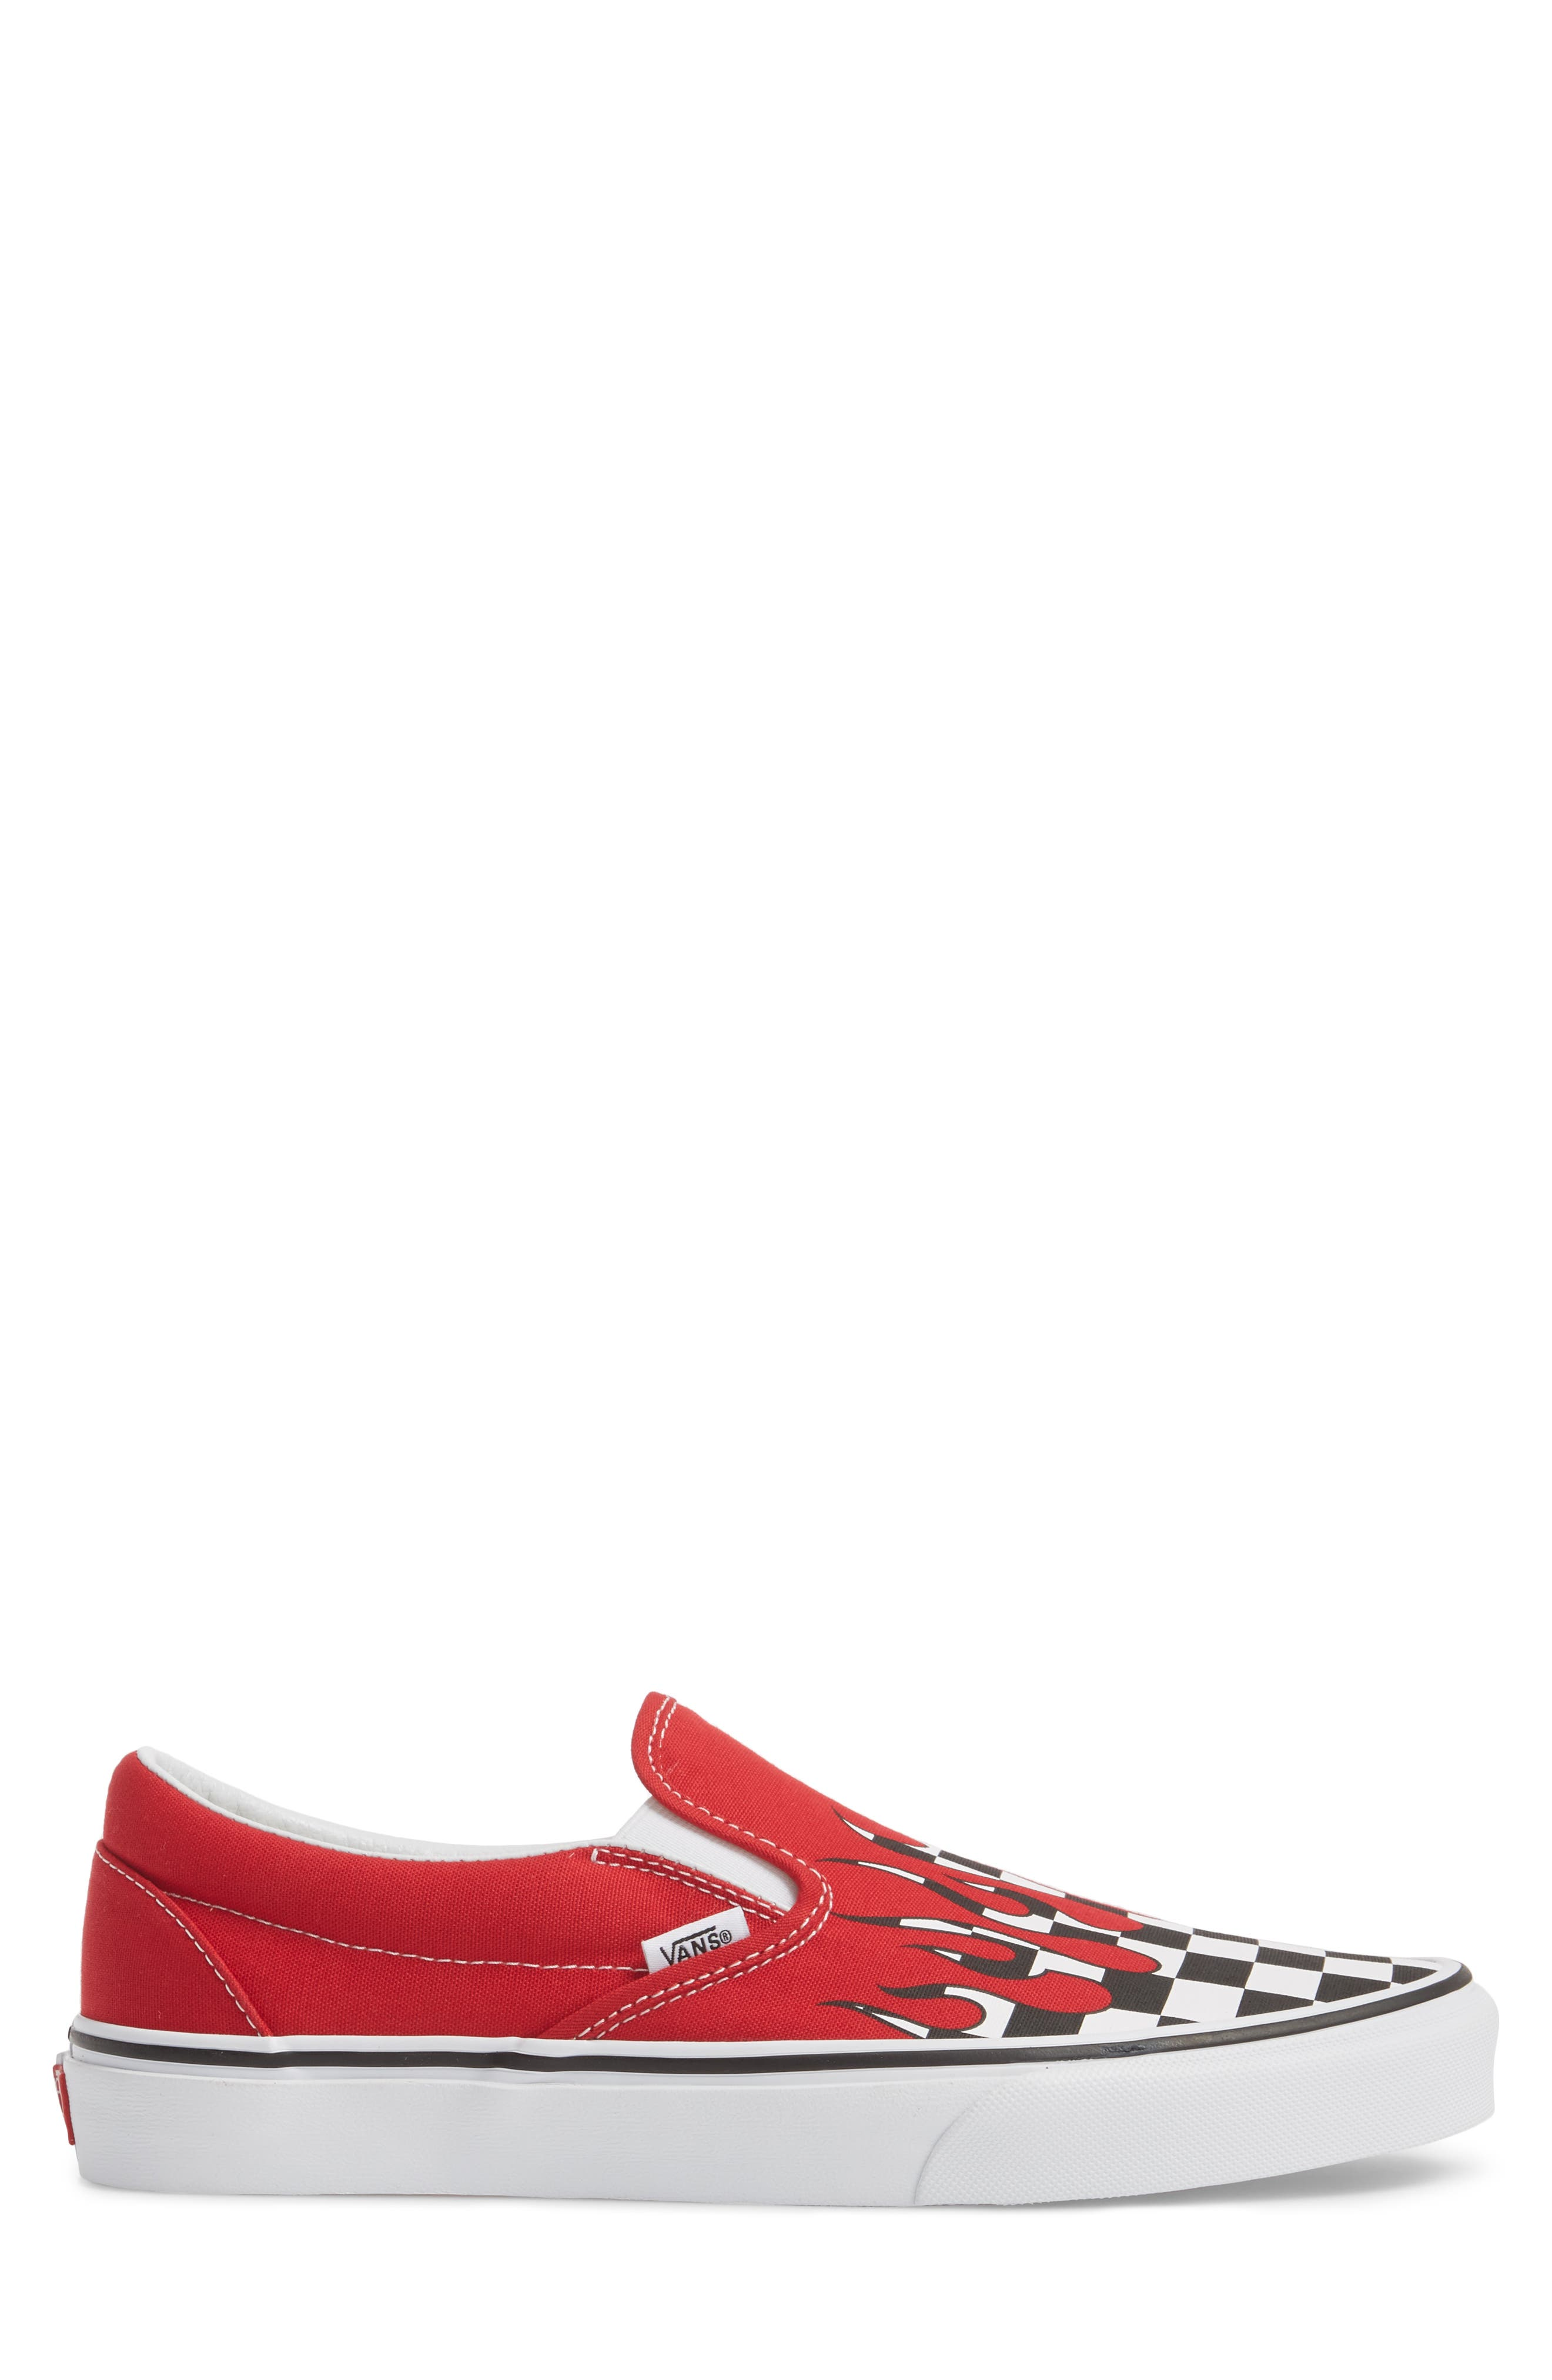 UA Classic Slip-On Sneaker,                             Alternate thumbnail 6, color,                             Racing Red/ White Checker